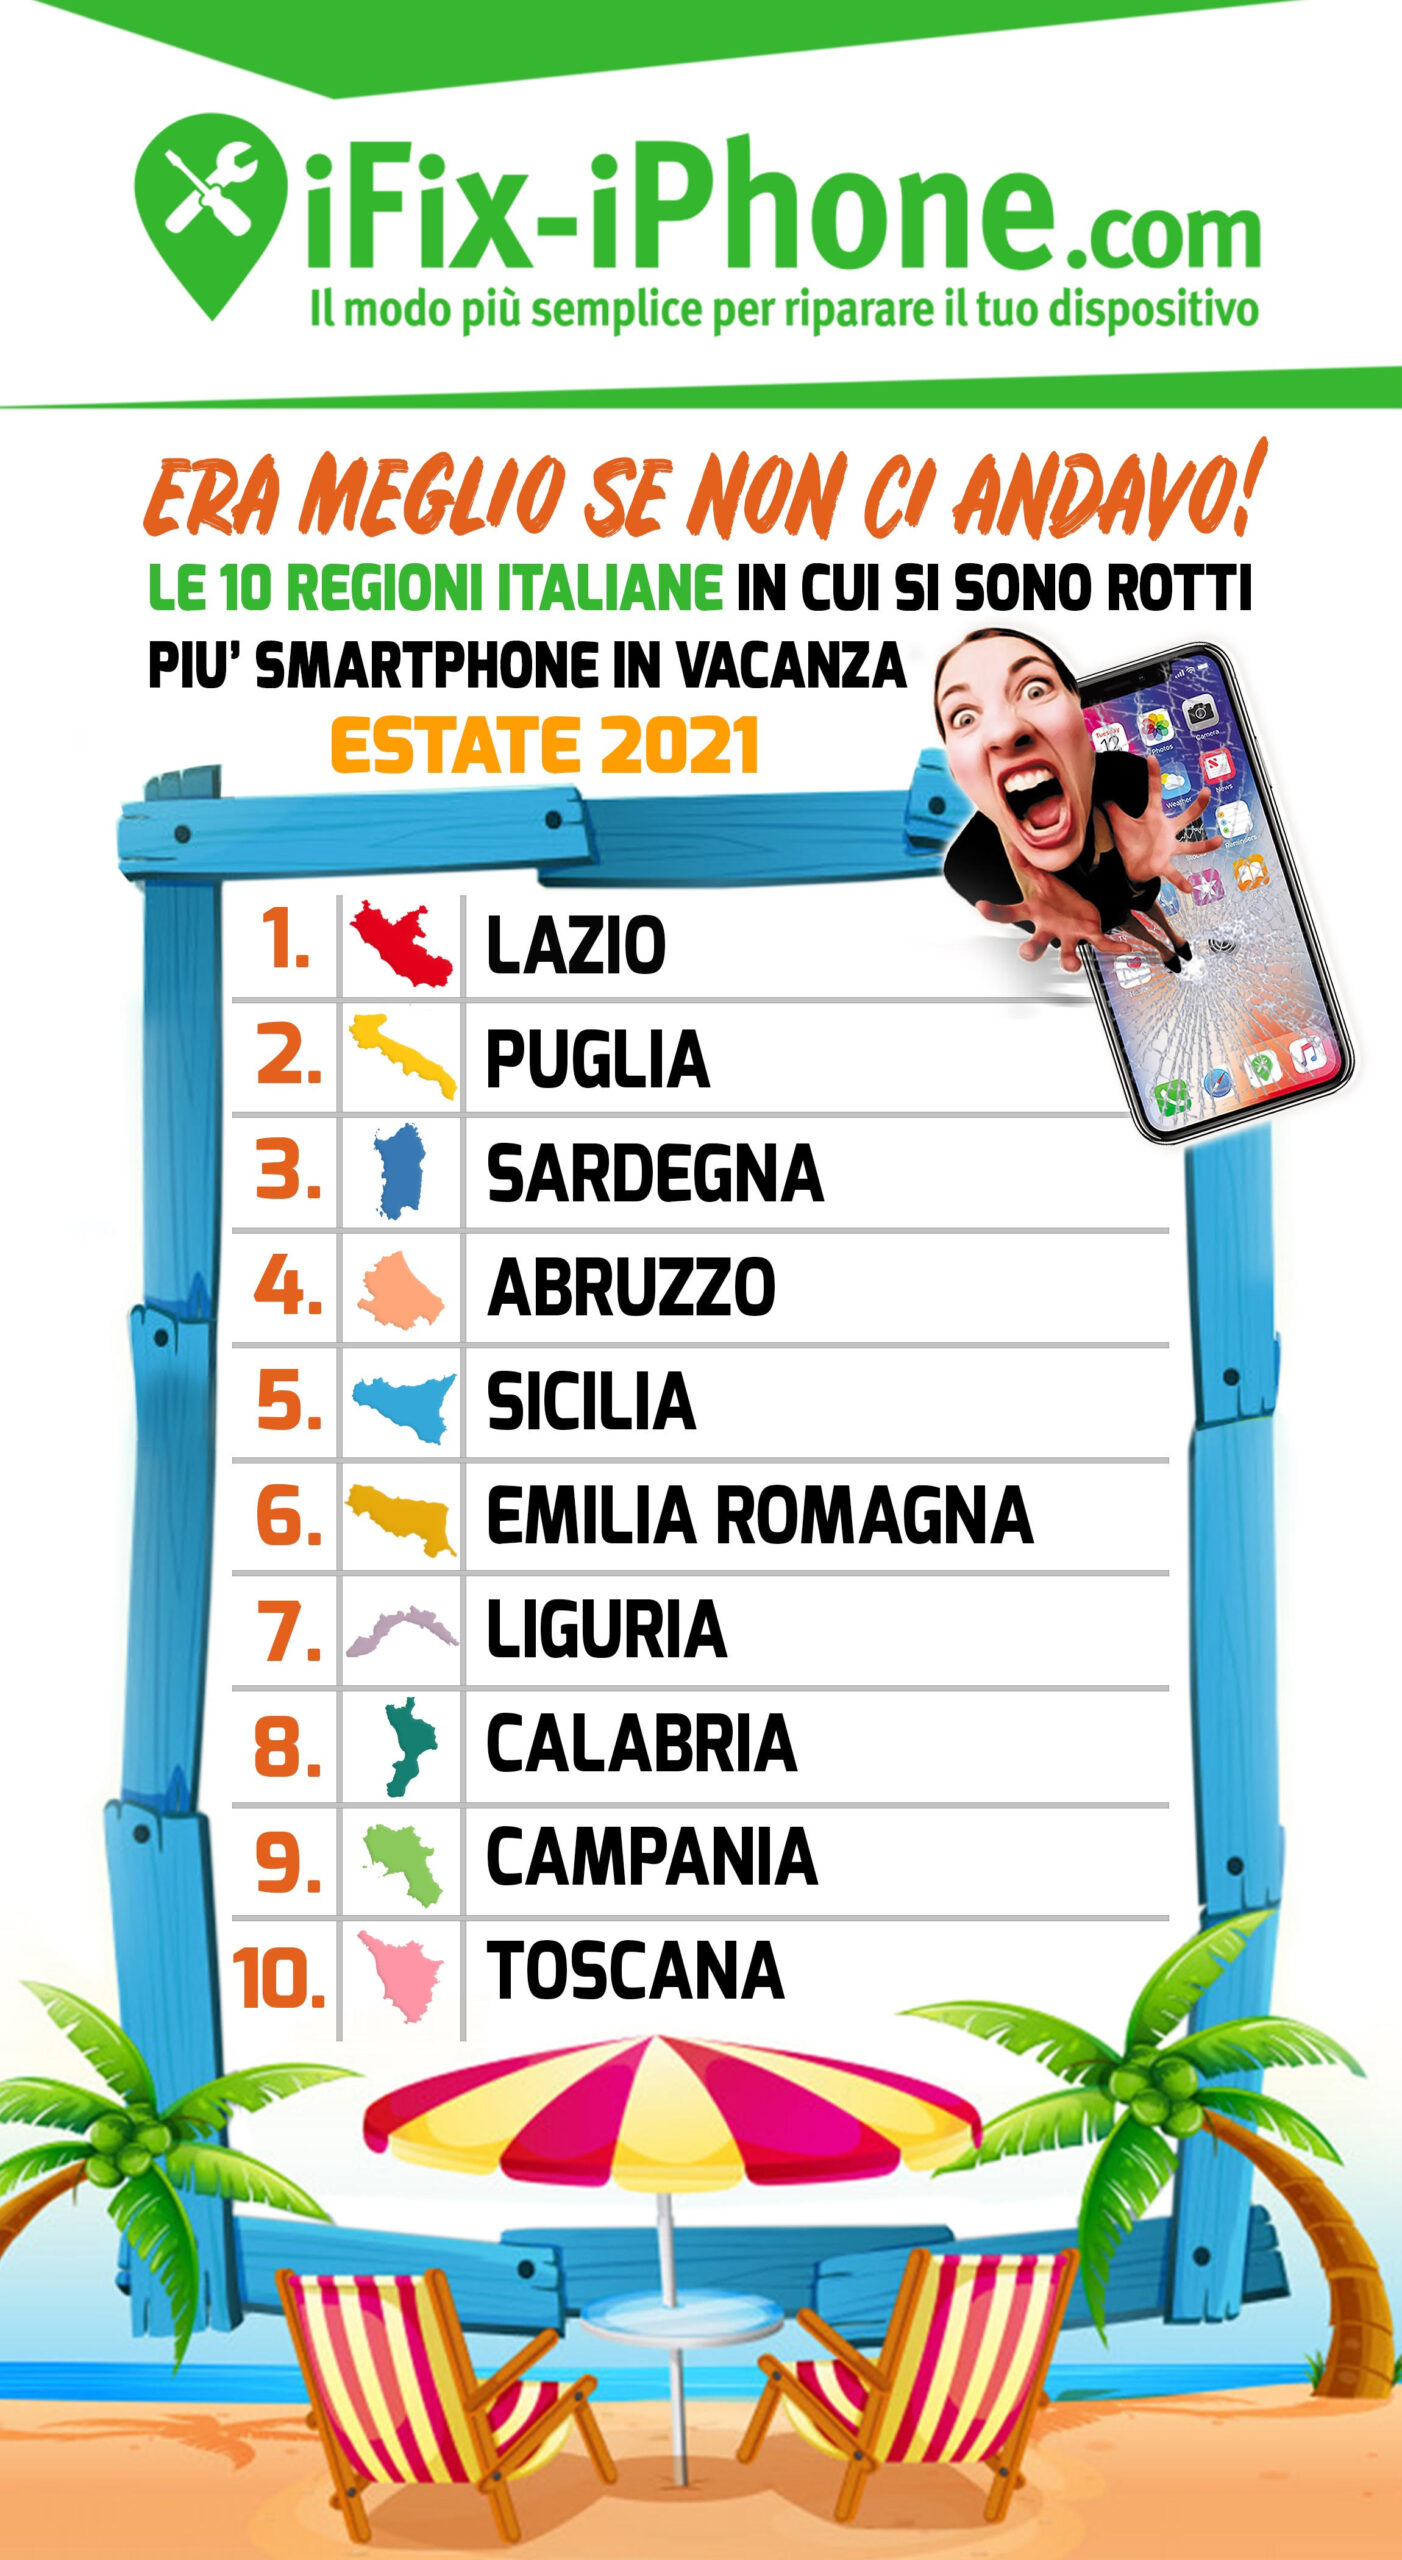 classifica regioni italiane rotture smartphone